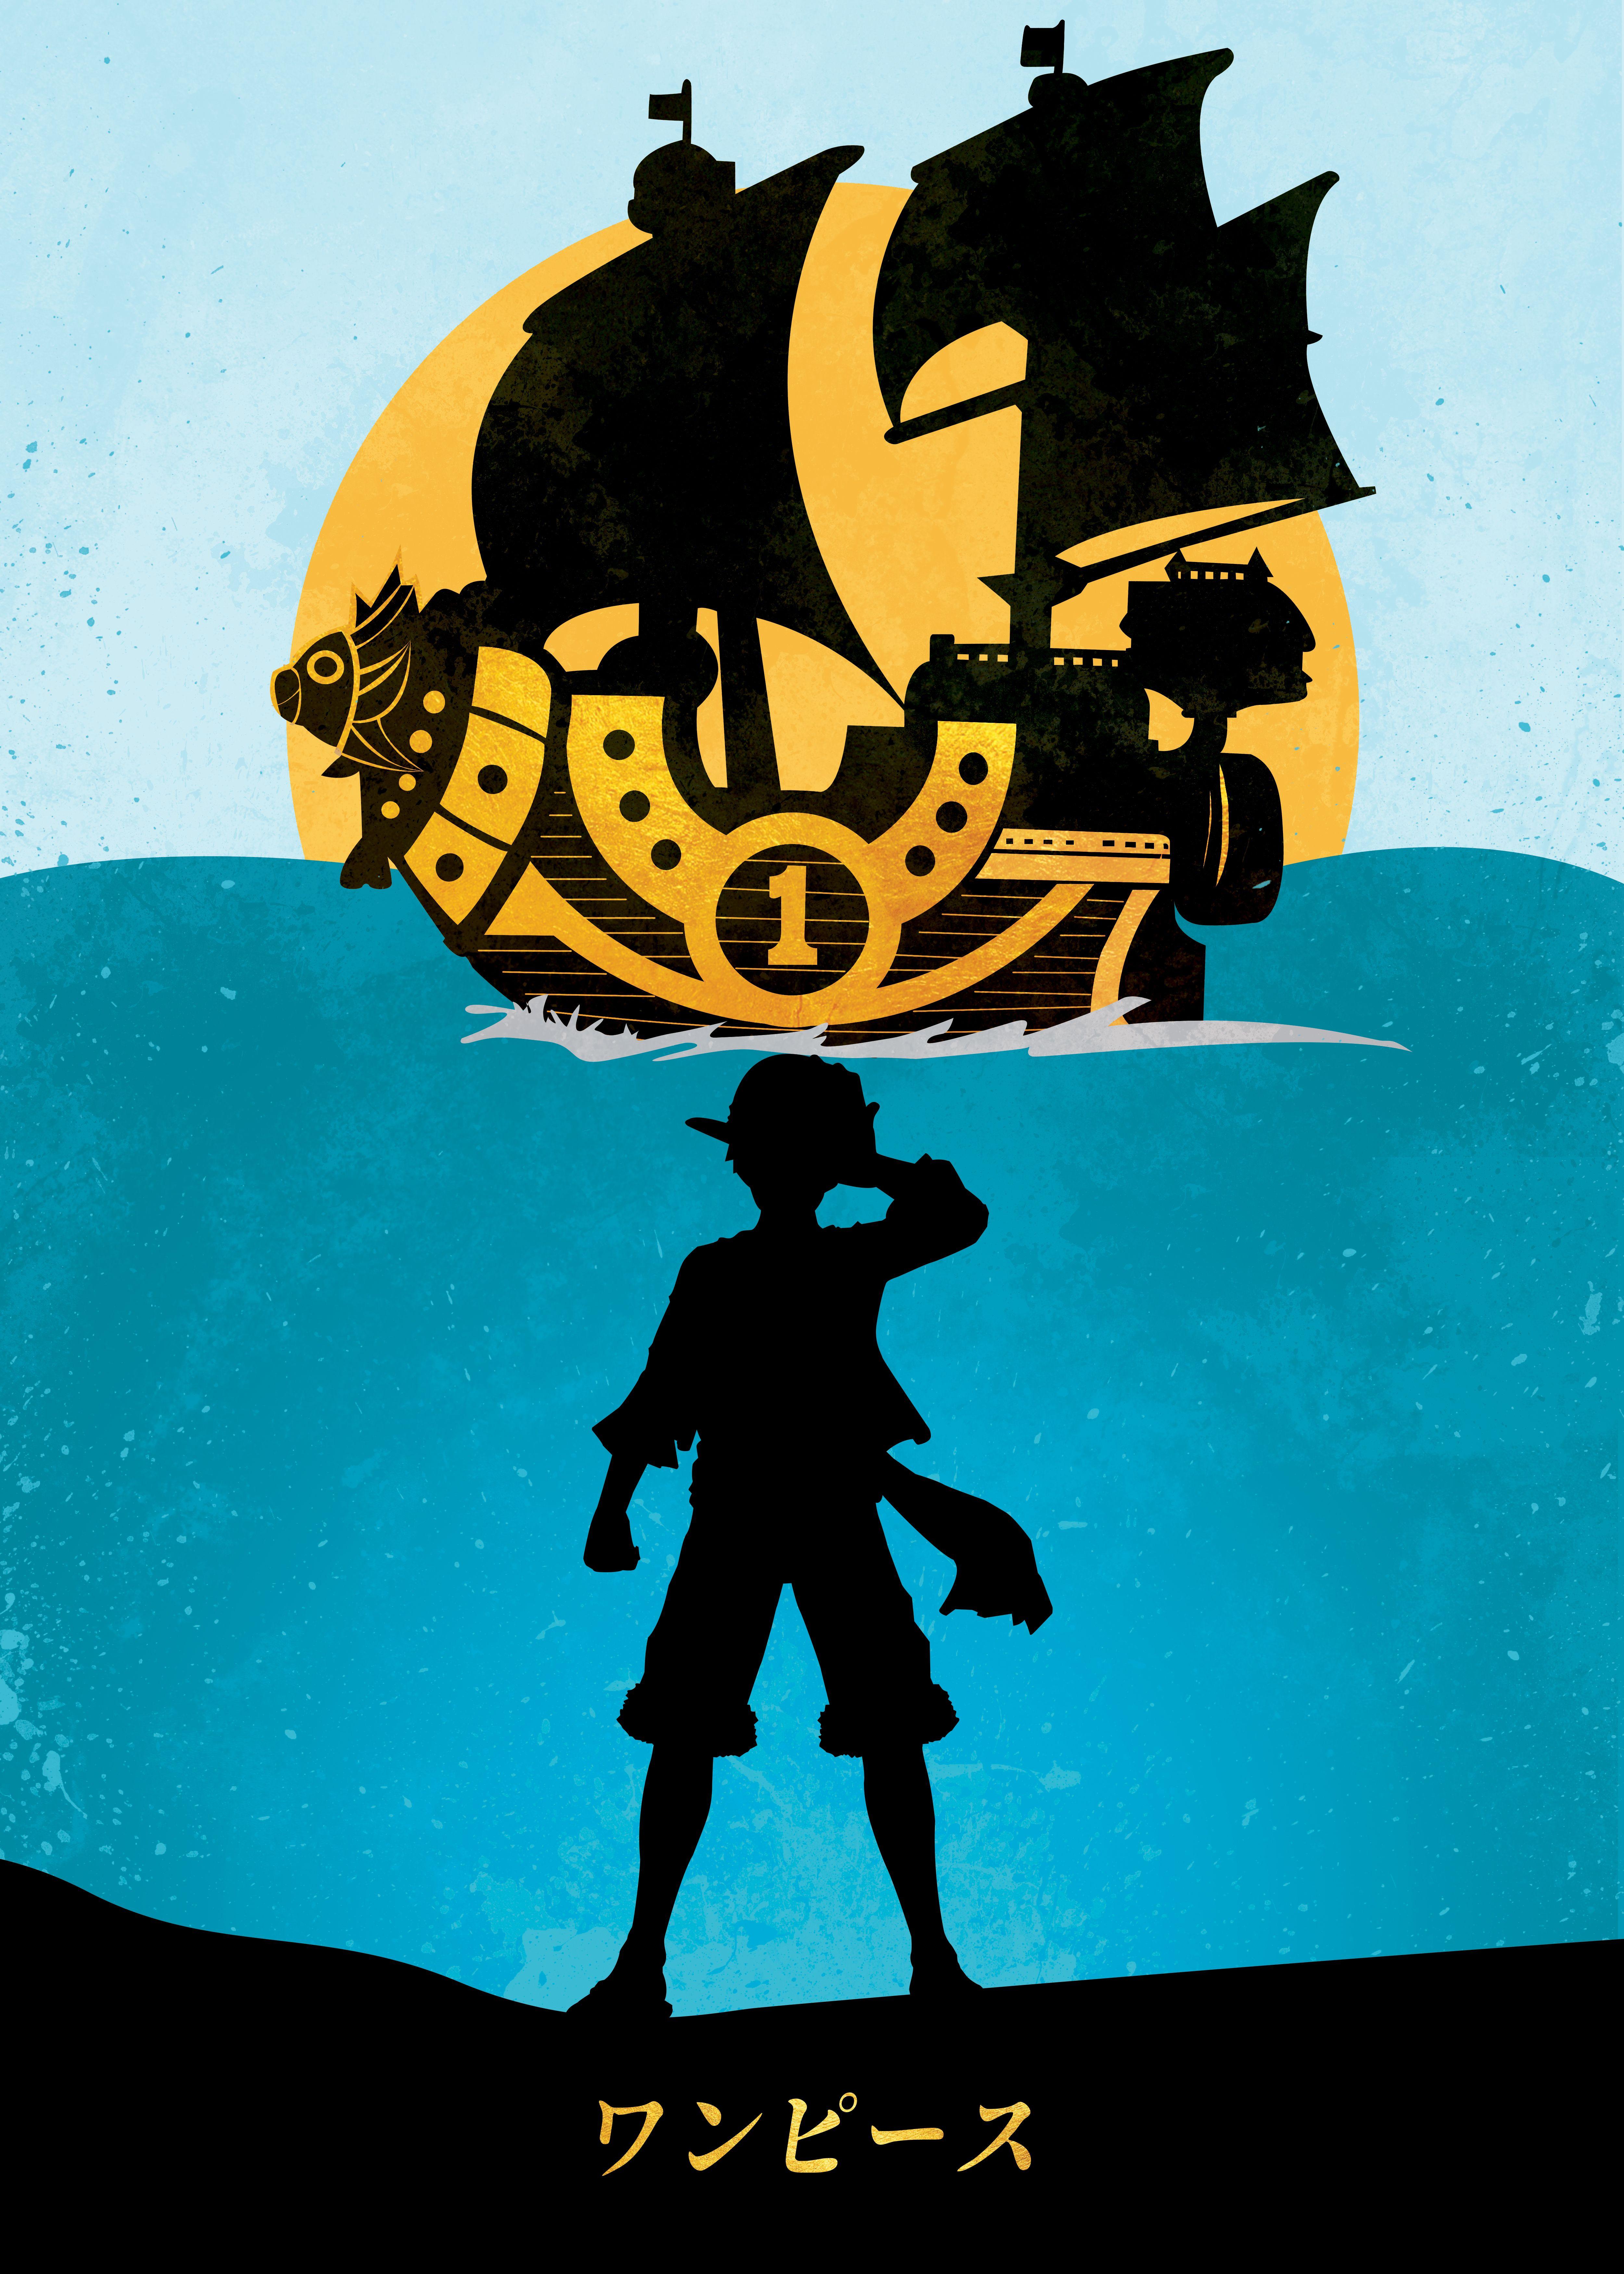 Journey Of A Pirate Metal Poster Sooru Displate One Piece Manga One Piece Comic One Piece Anime